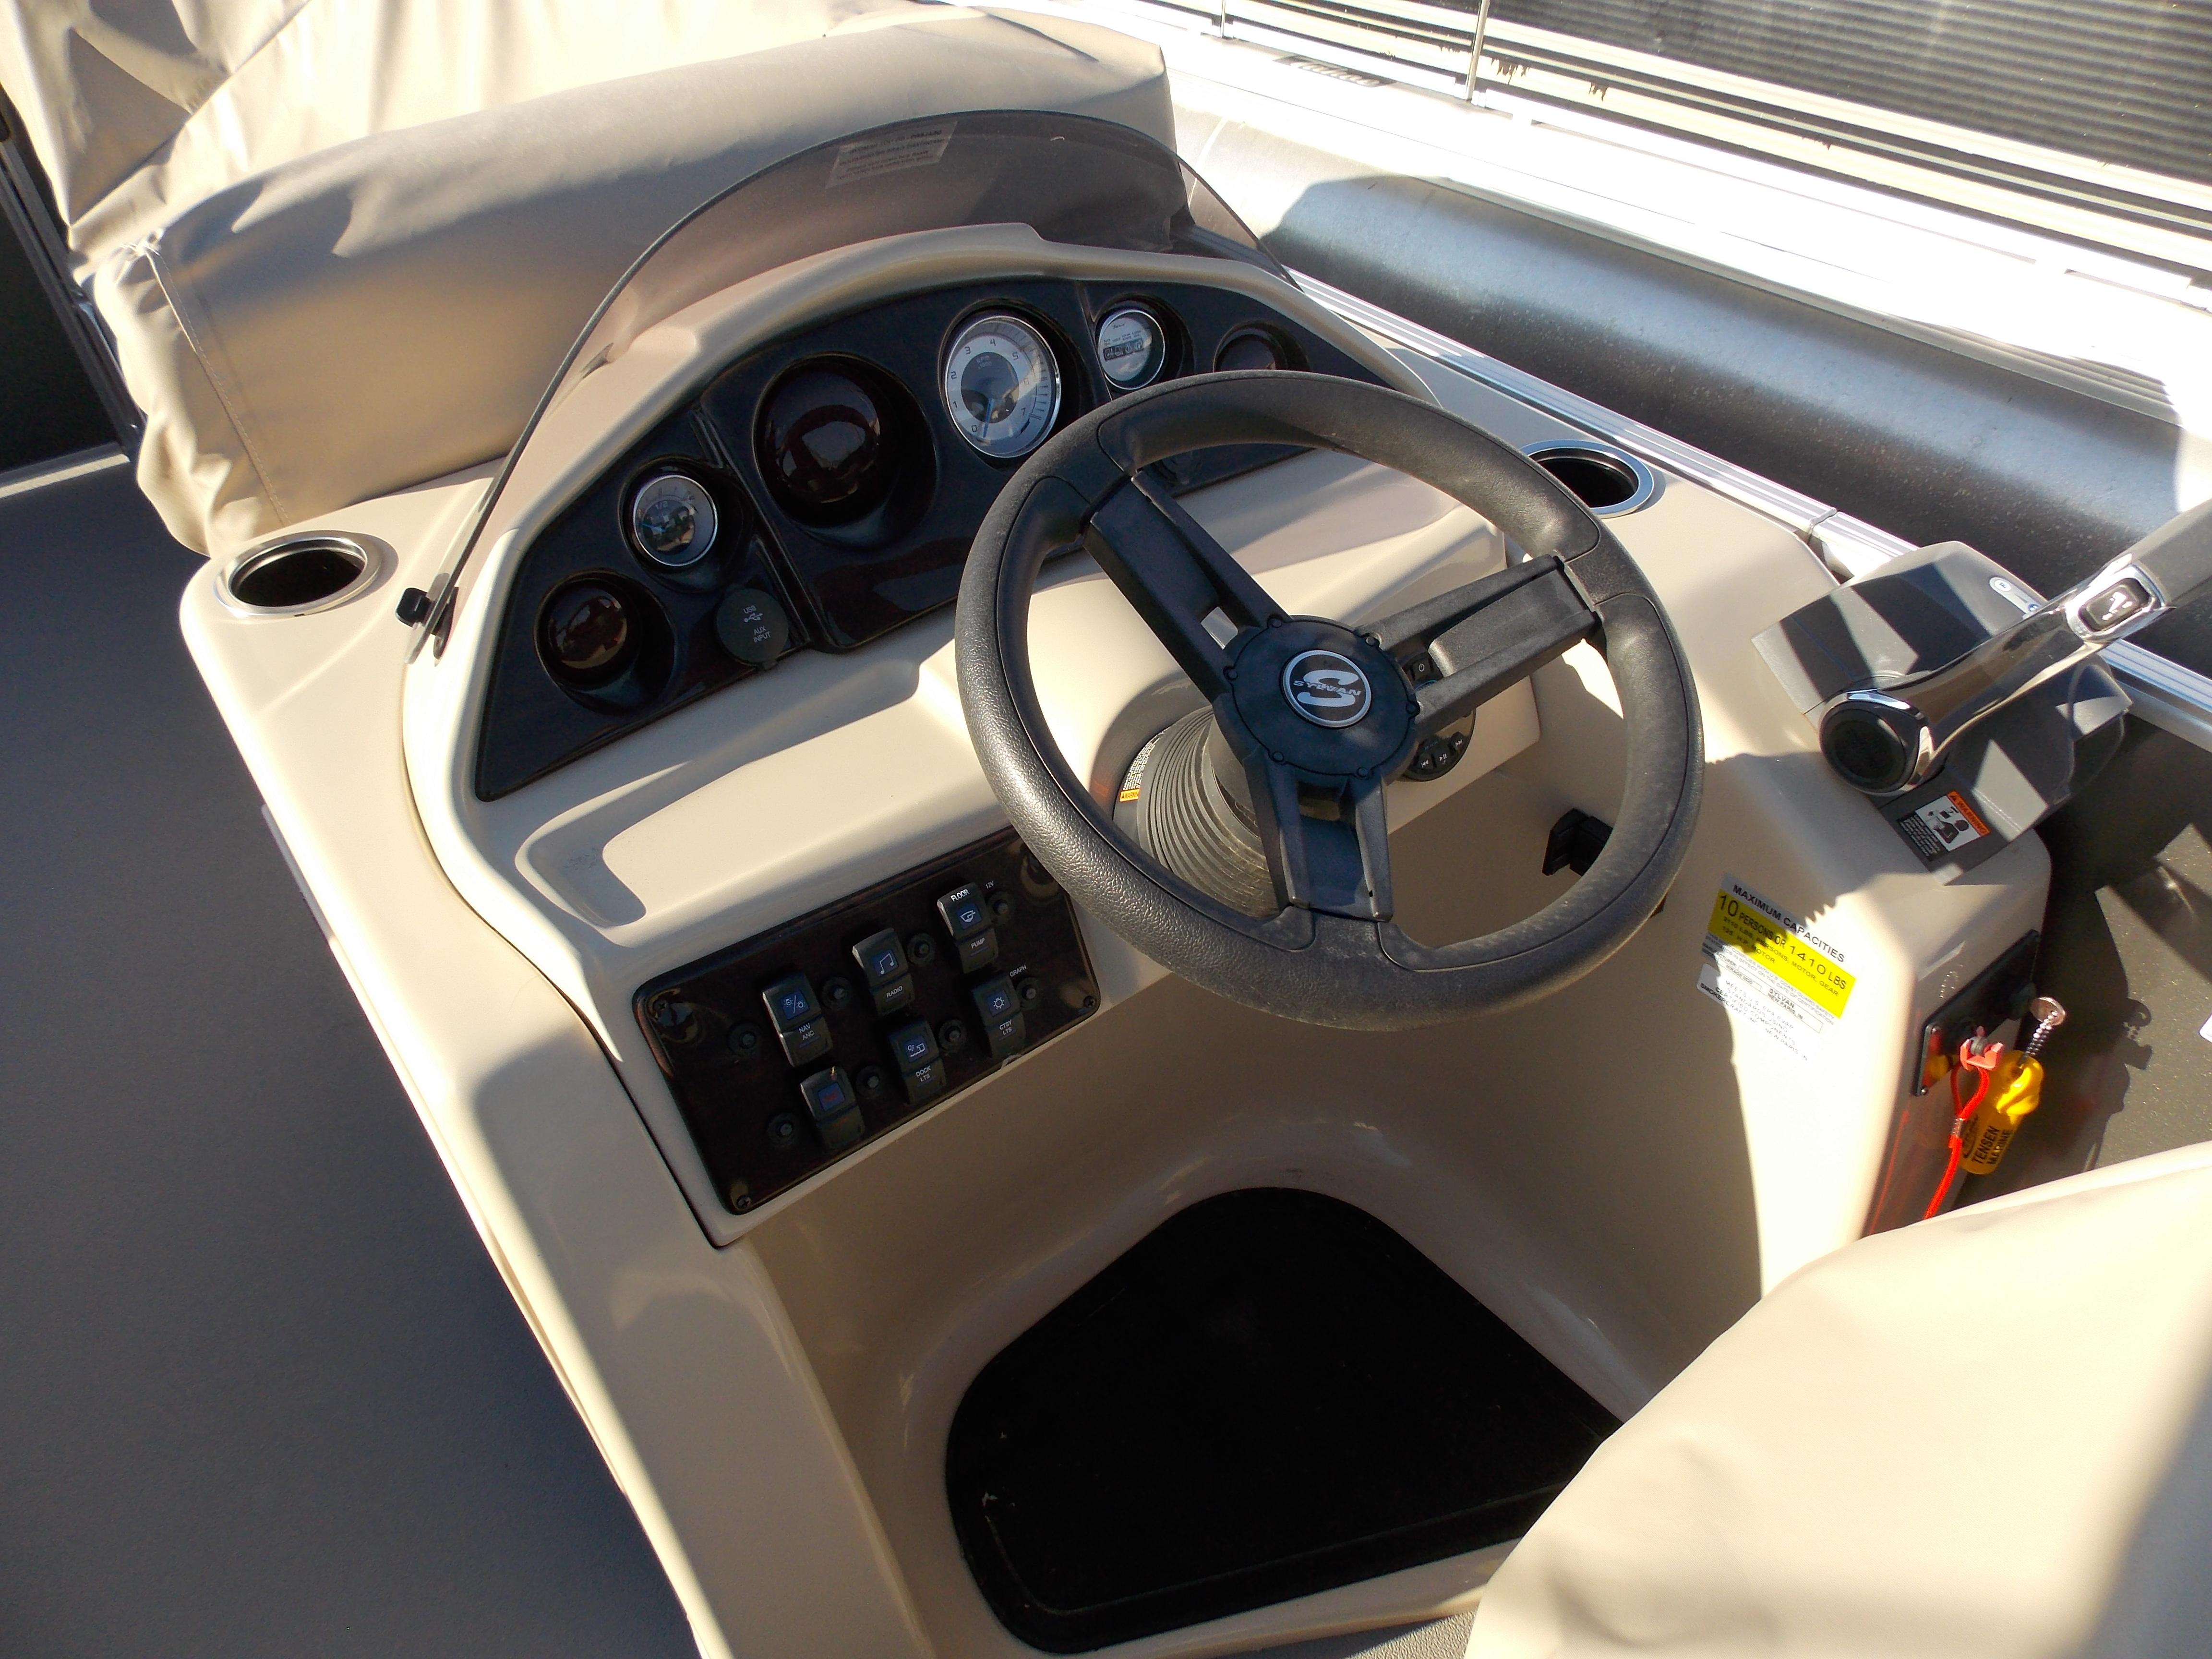 2019 Sylvan 8520 Mirage LZ 6